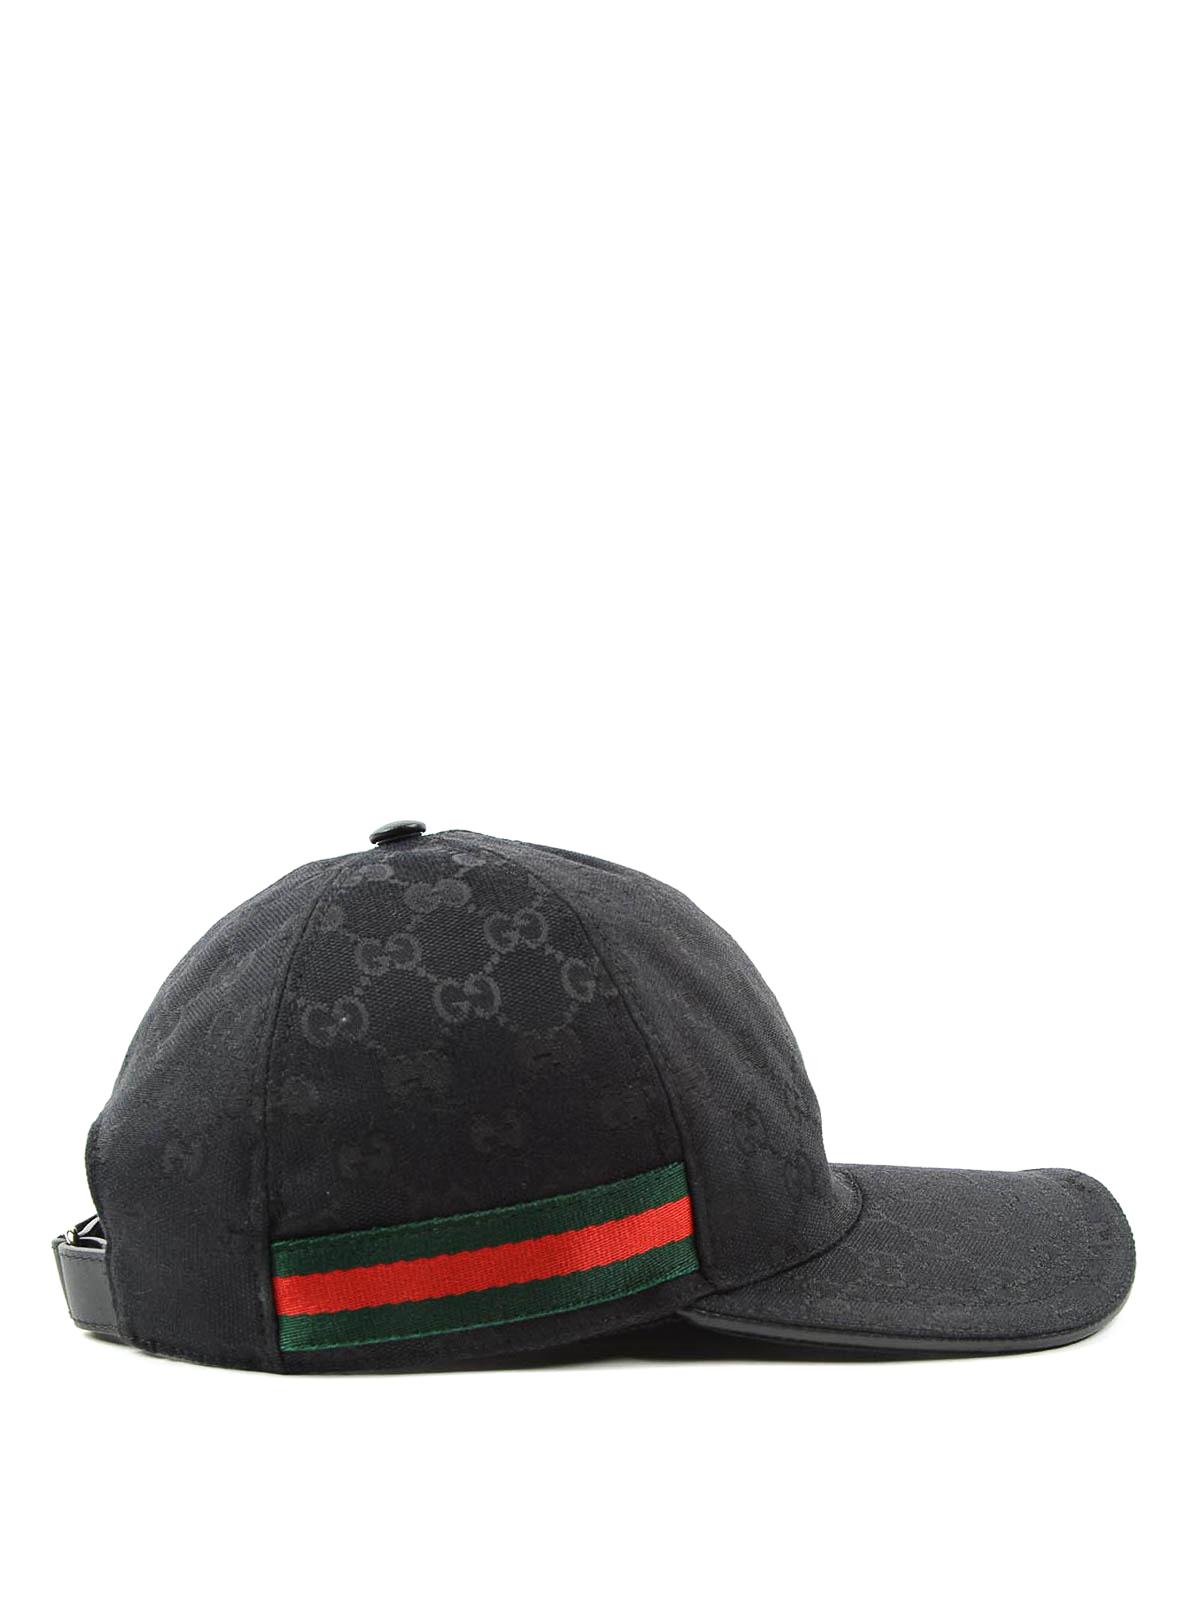 Gucci - GG SUPREME BASEBALL HAT - hats   caps - 200035 KQWBG 1060 3a351fd75b2